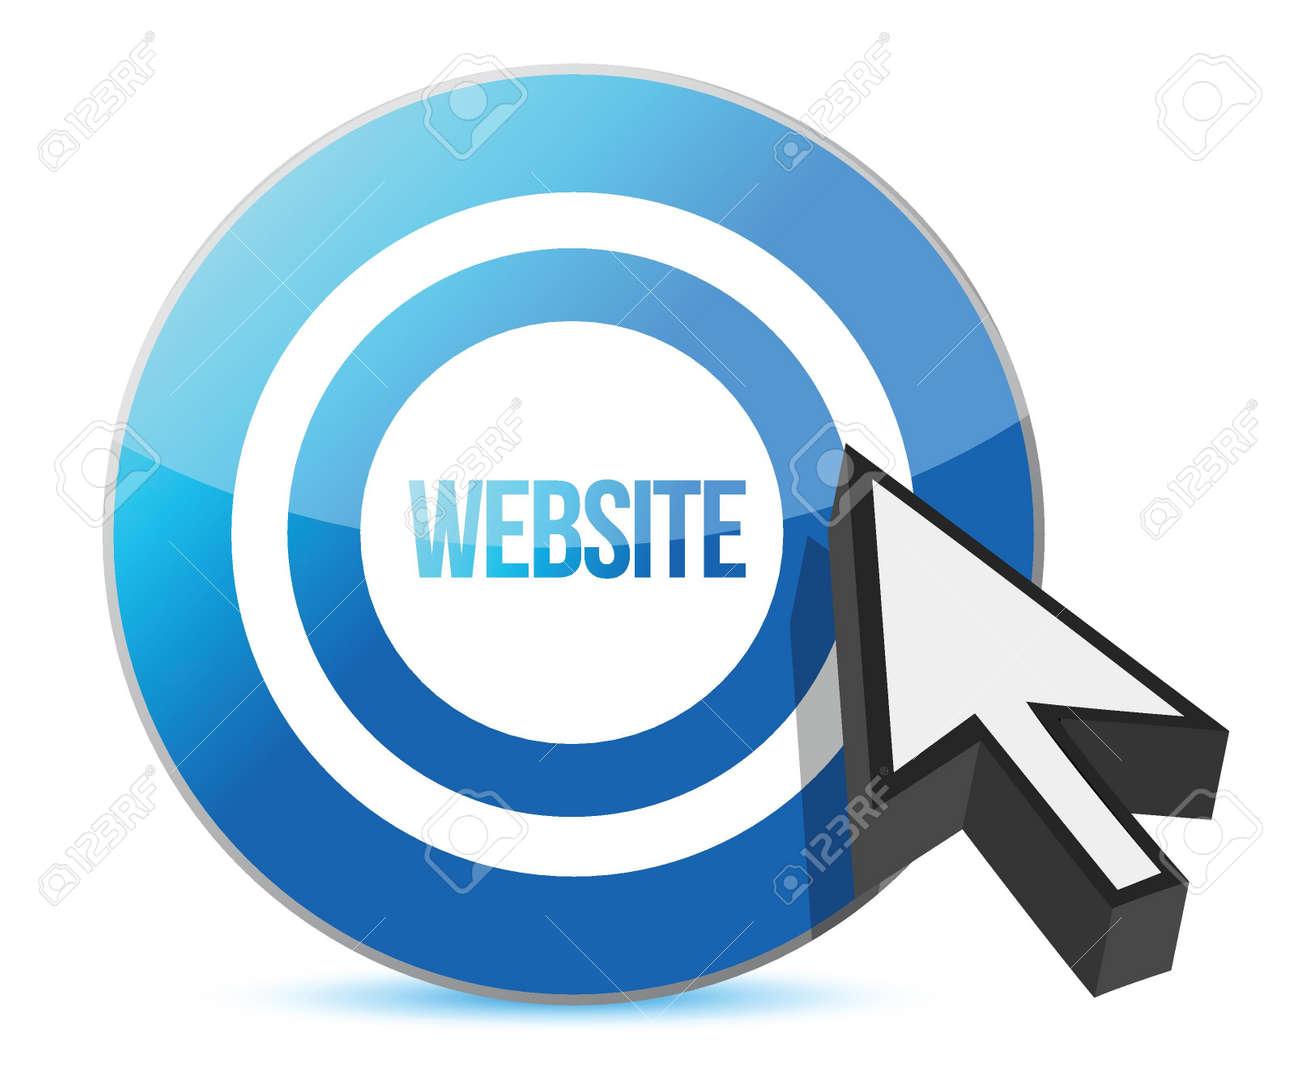 Website target illustration design over a white background Stock Vector - 16836752